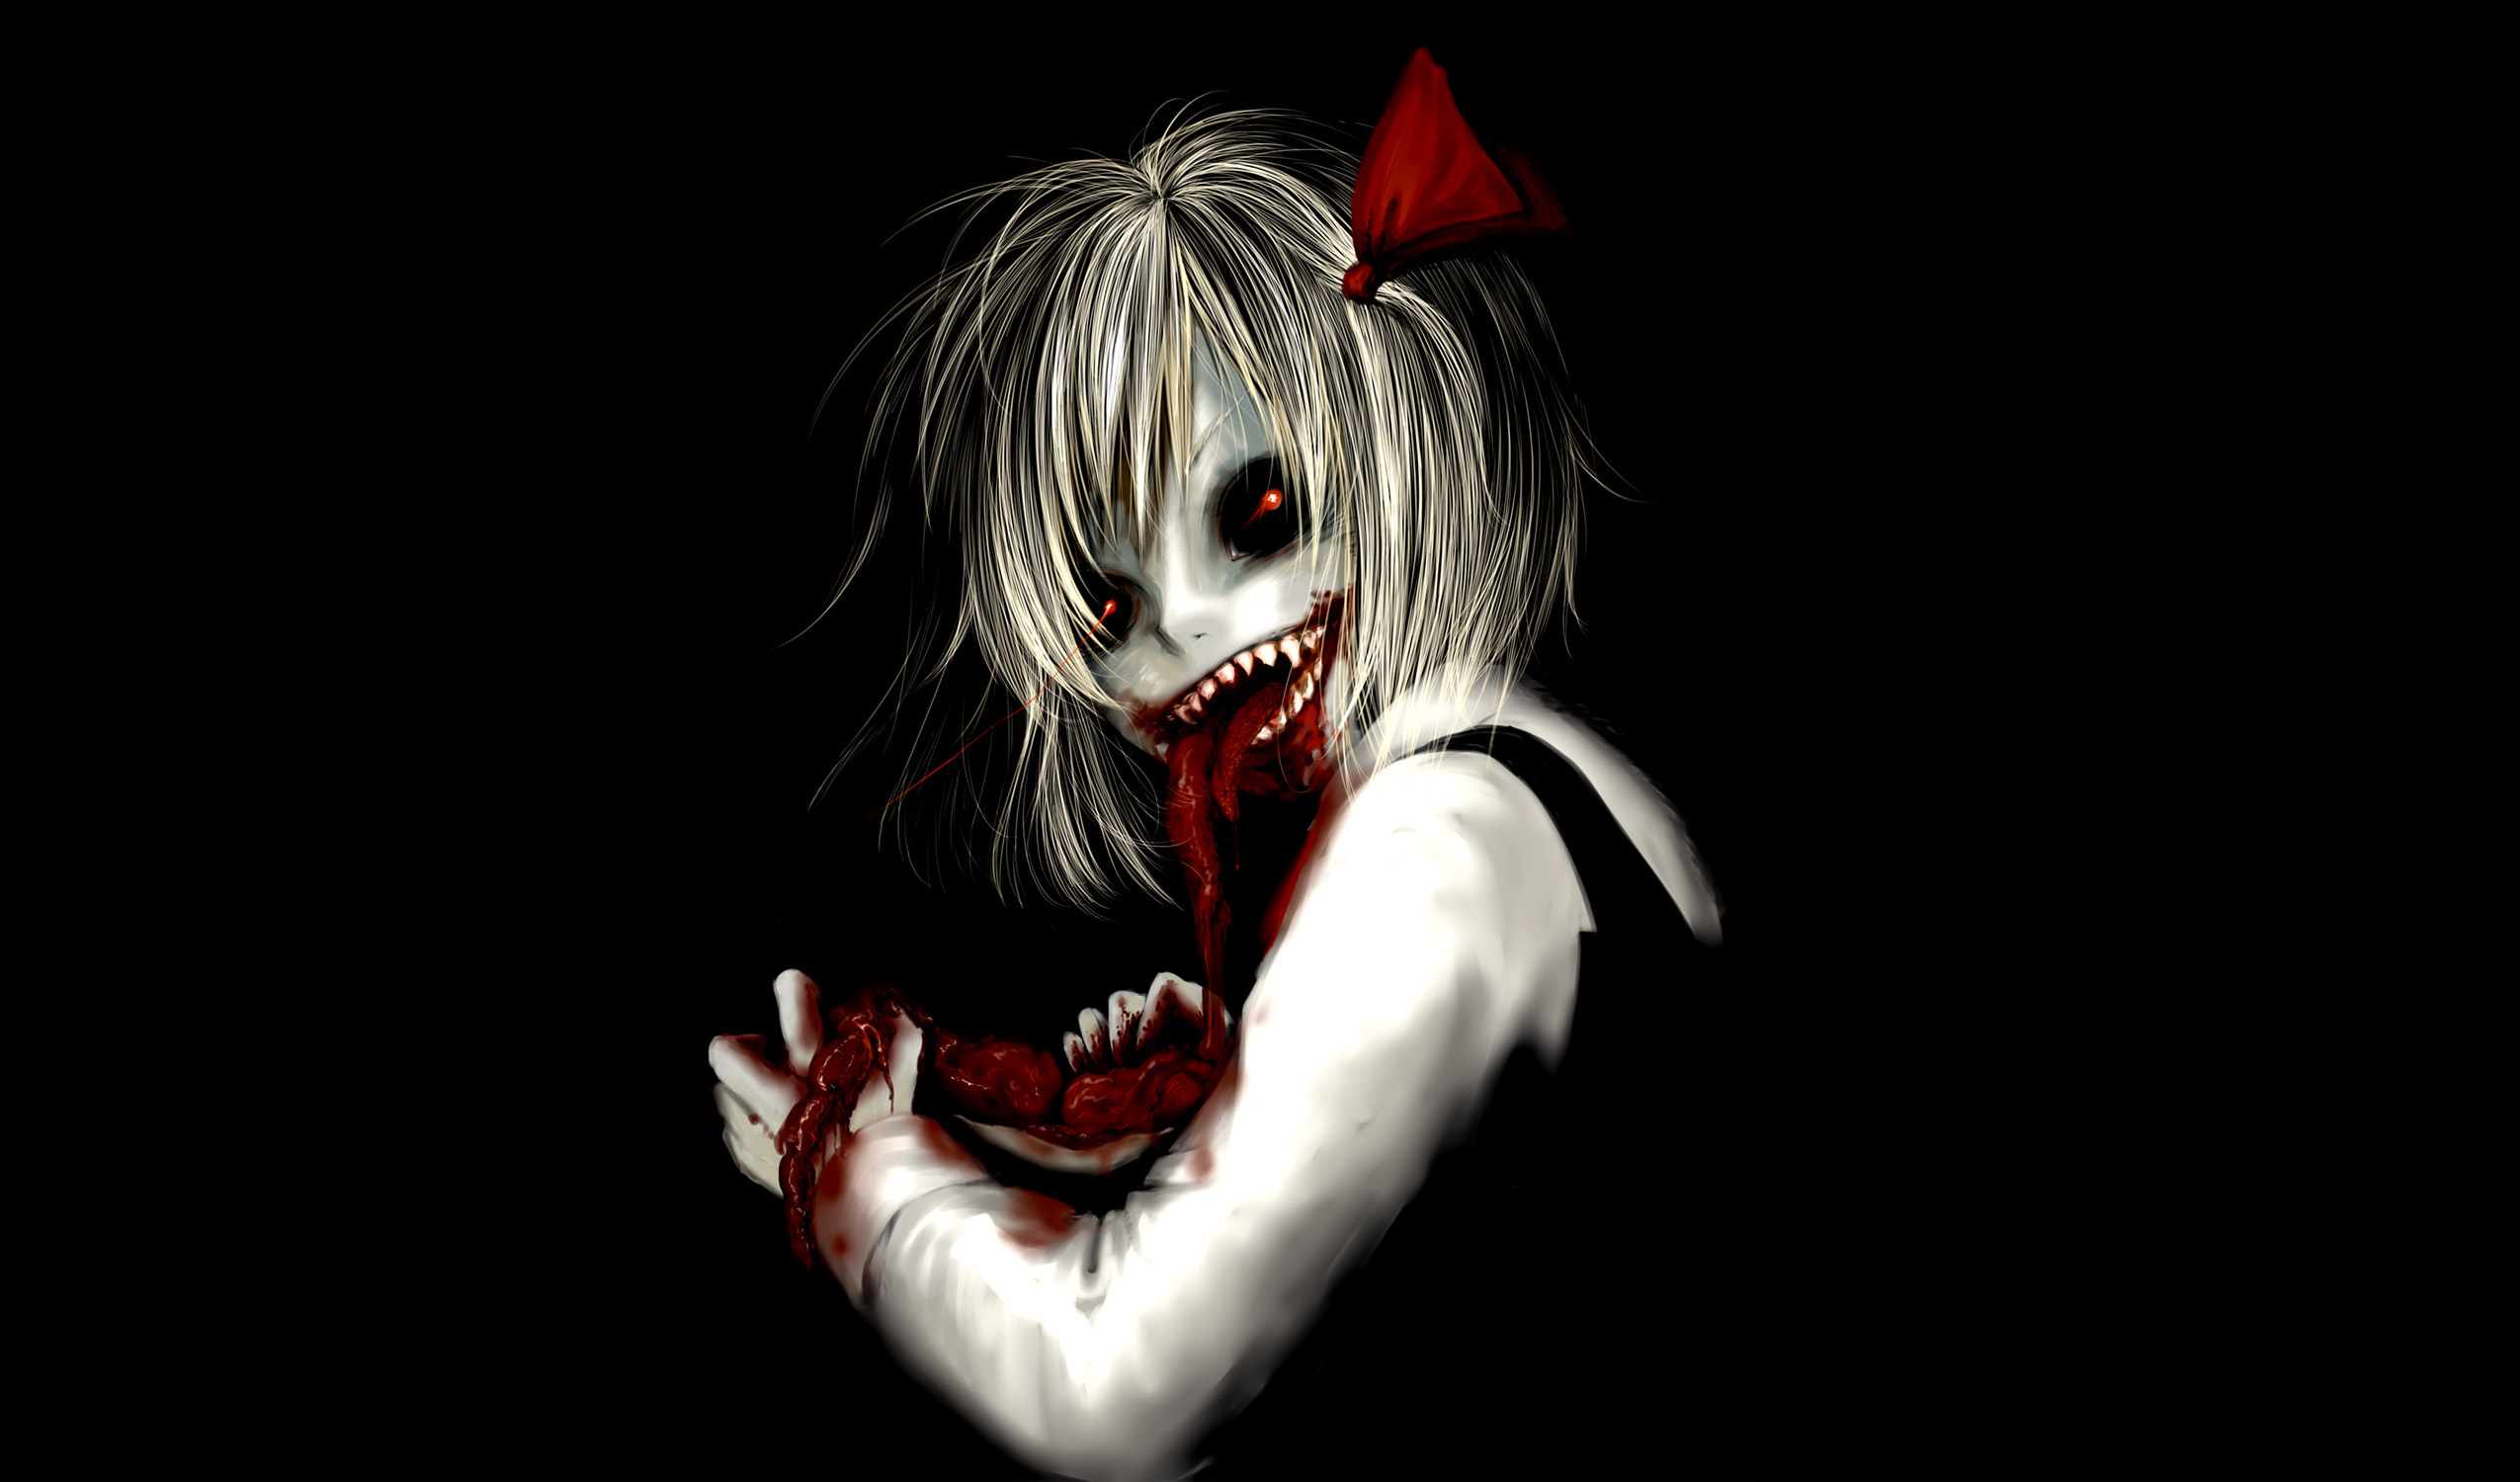 Dark Horror Anime Macabre Blood Guts Evil Girl Wallpaper 2550x1500